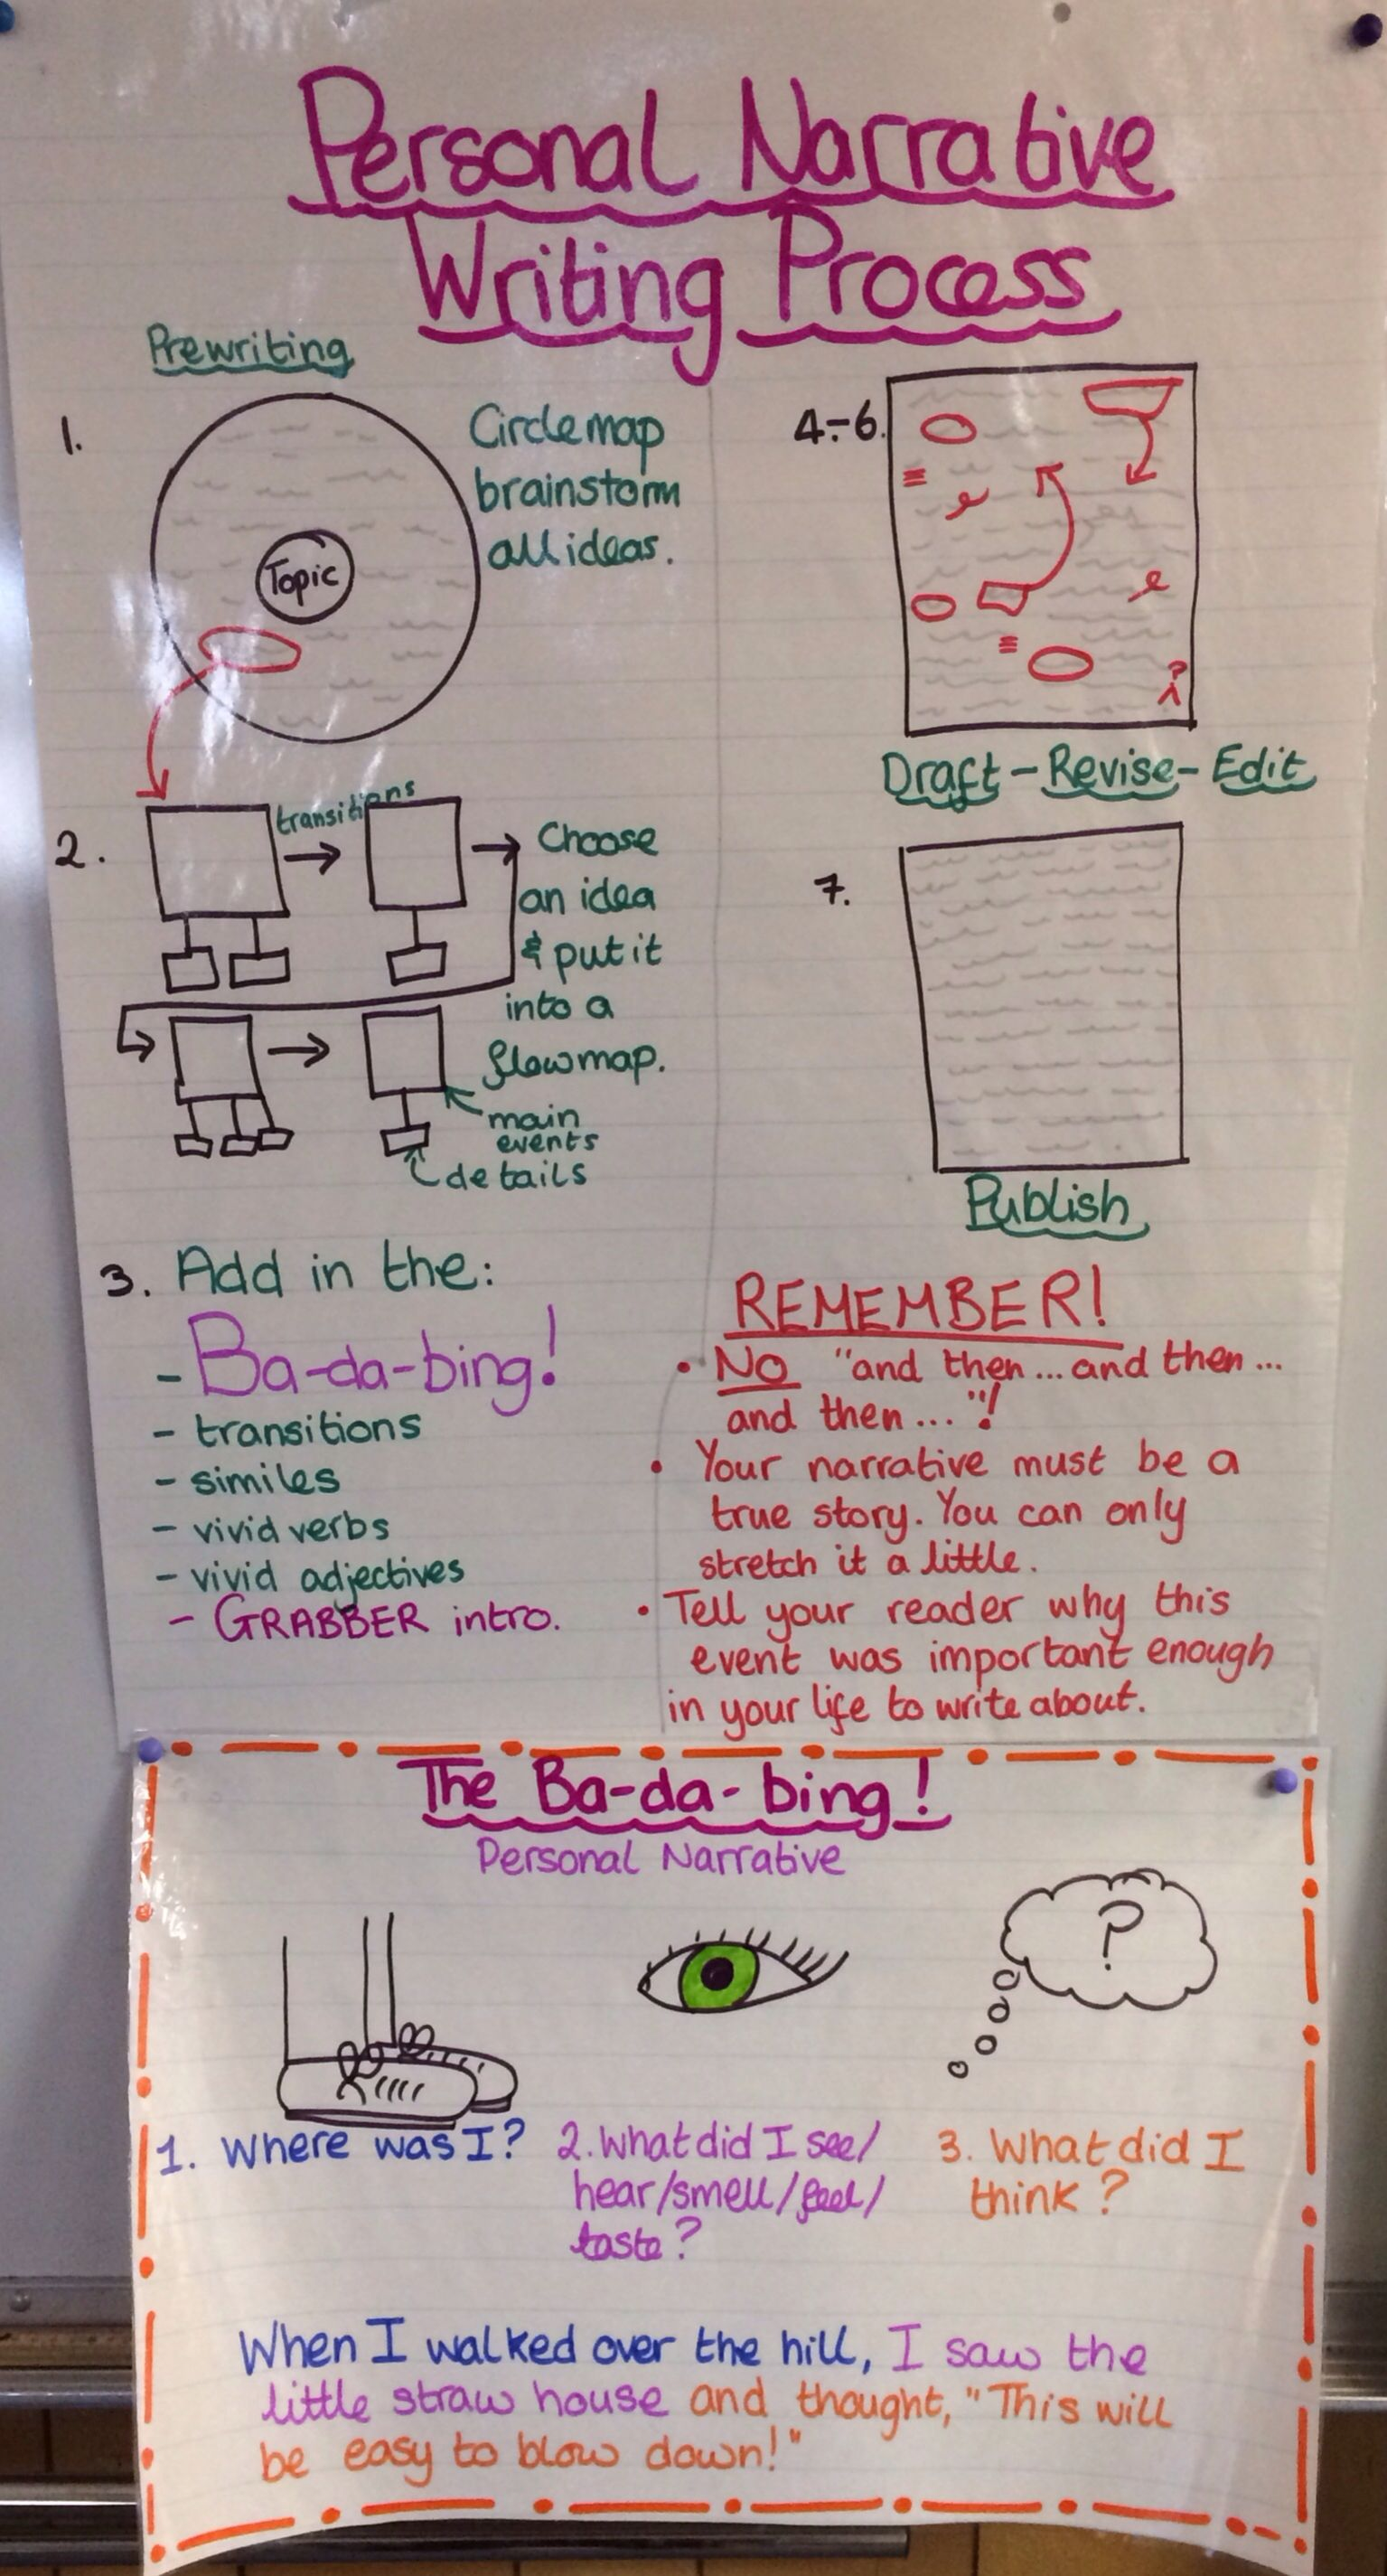 4th Grade Personal Narrative Steps Writing Instruction Narrative Writing Teaching Writing How to teach narrative writing to